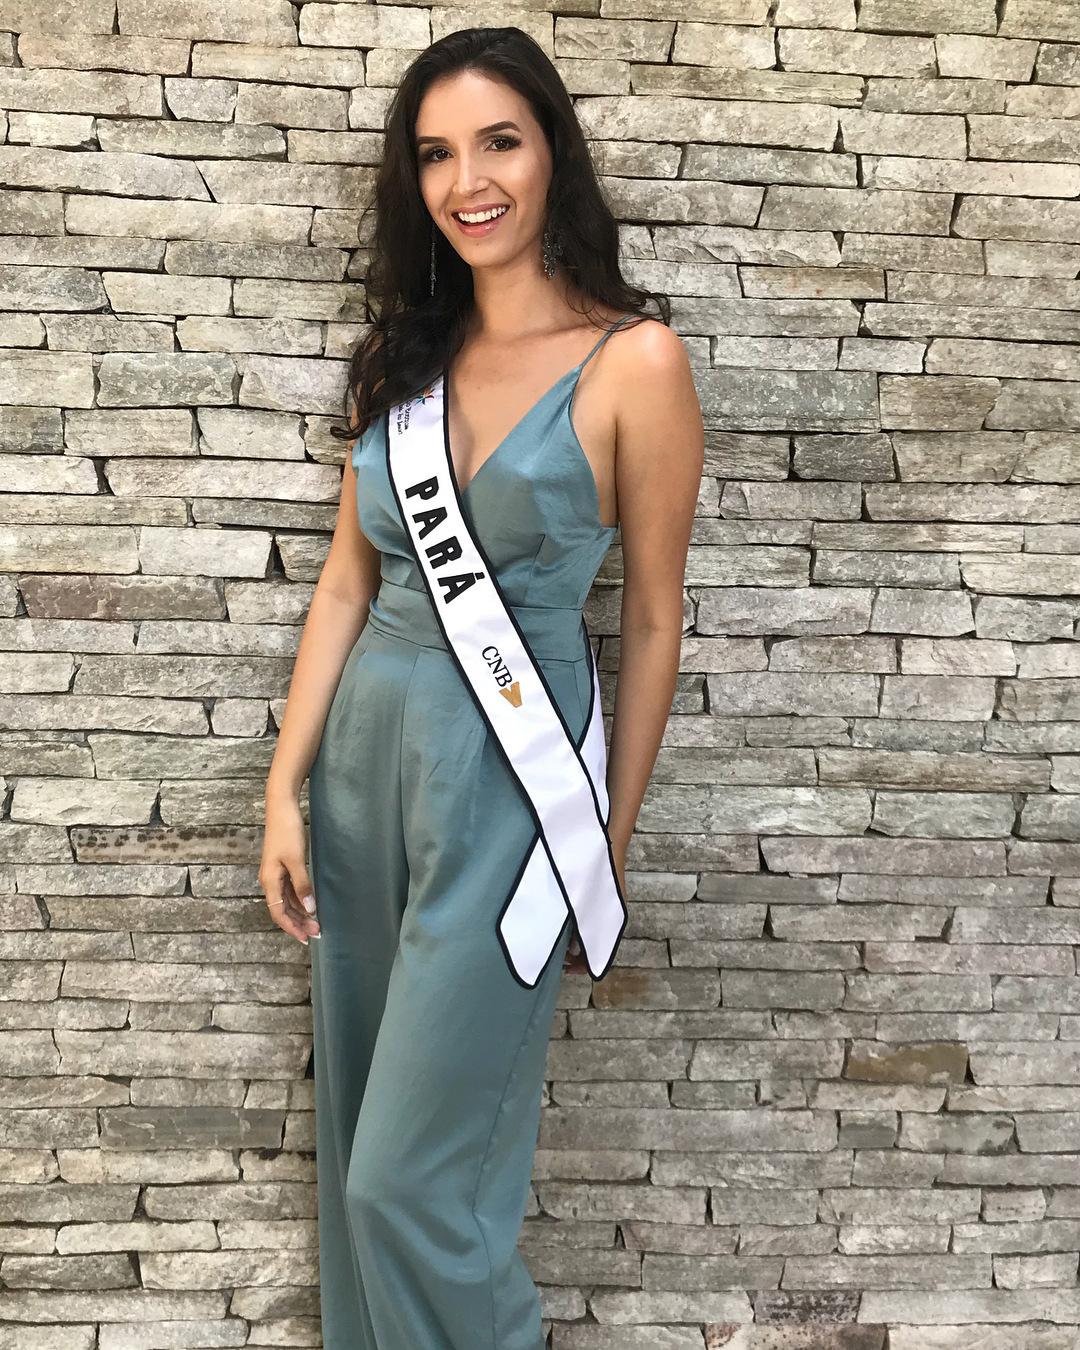 isabella garcia, top 8 de miss brasil mundo 2018/top 20 de miss brasil mundo 2019. - Página 3 38236410